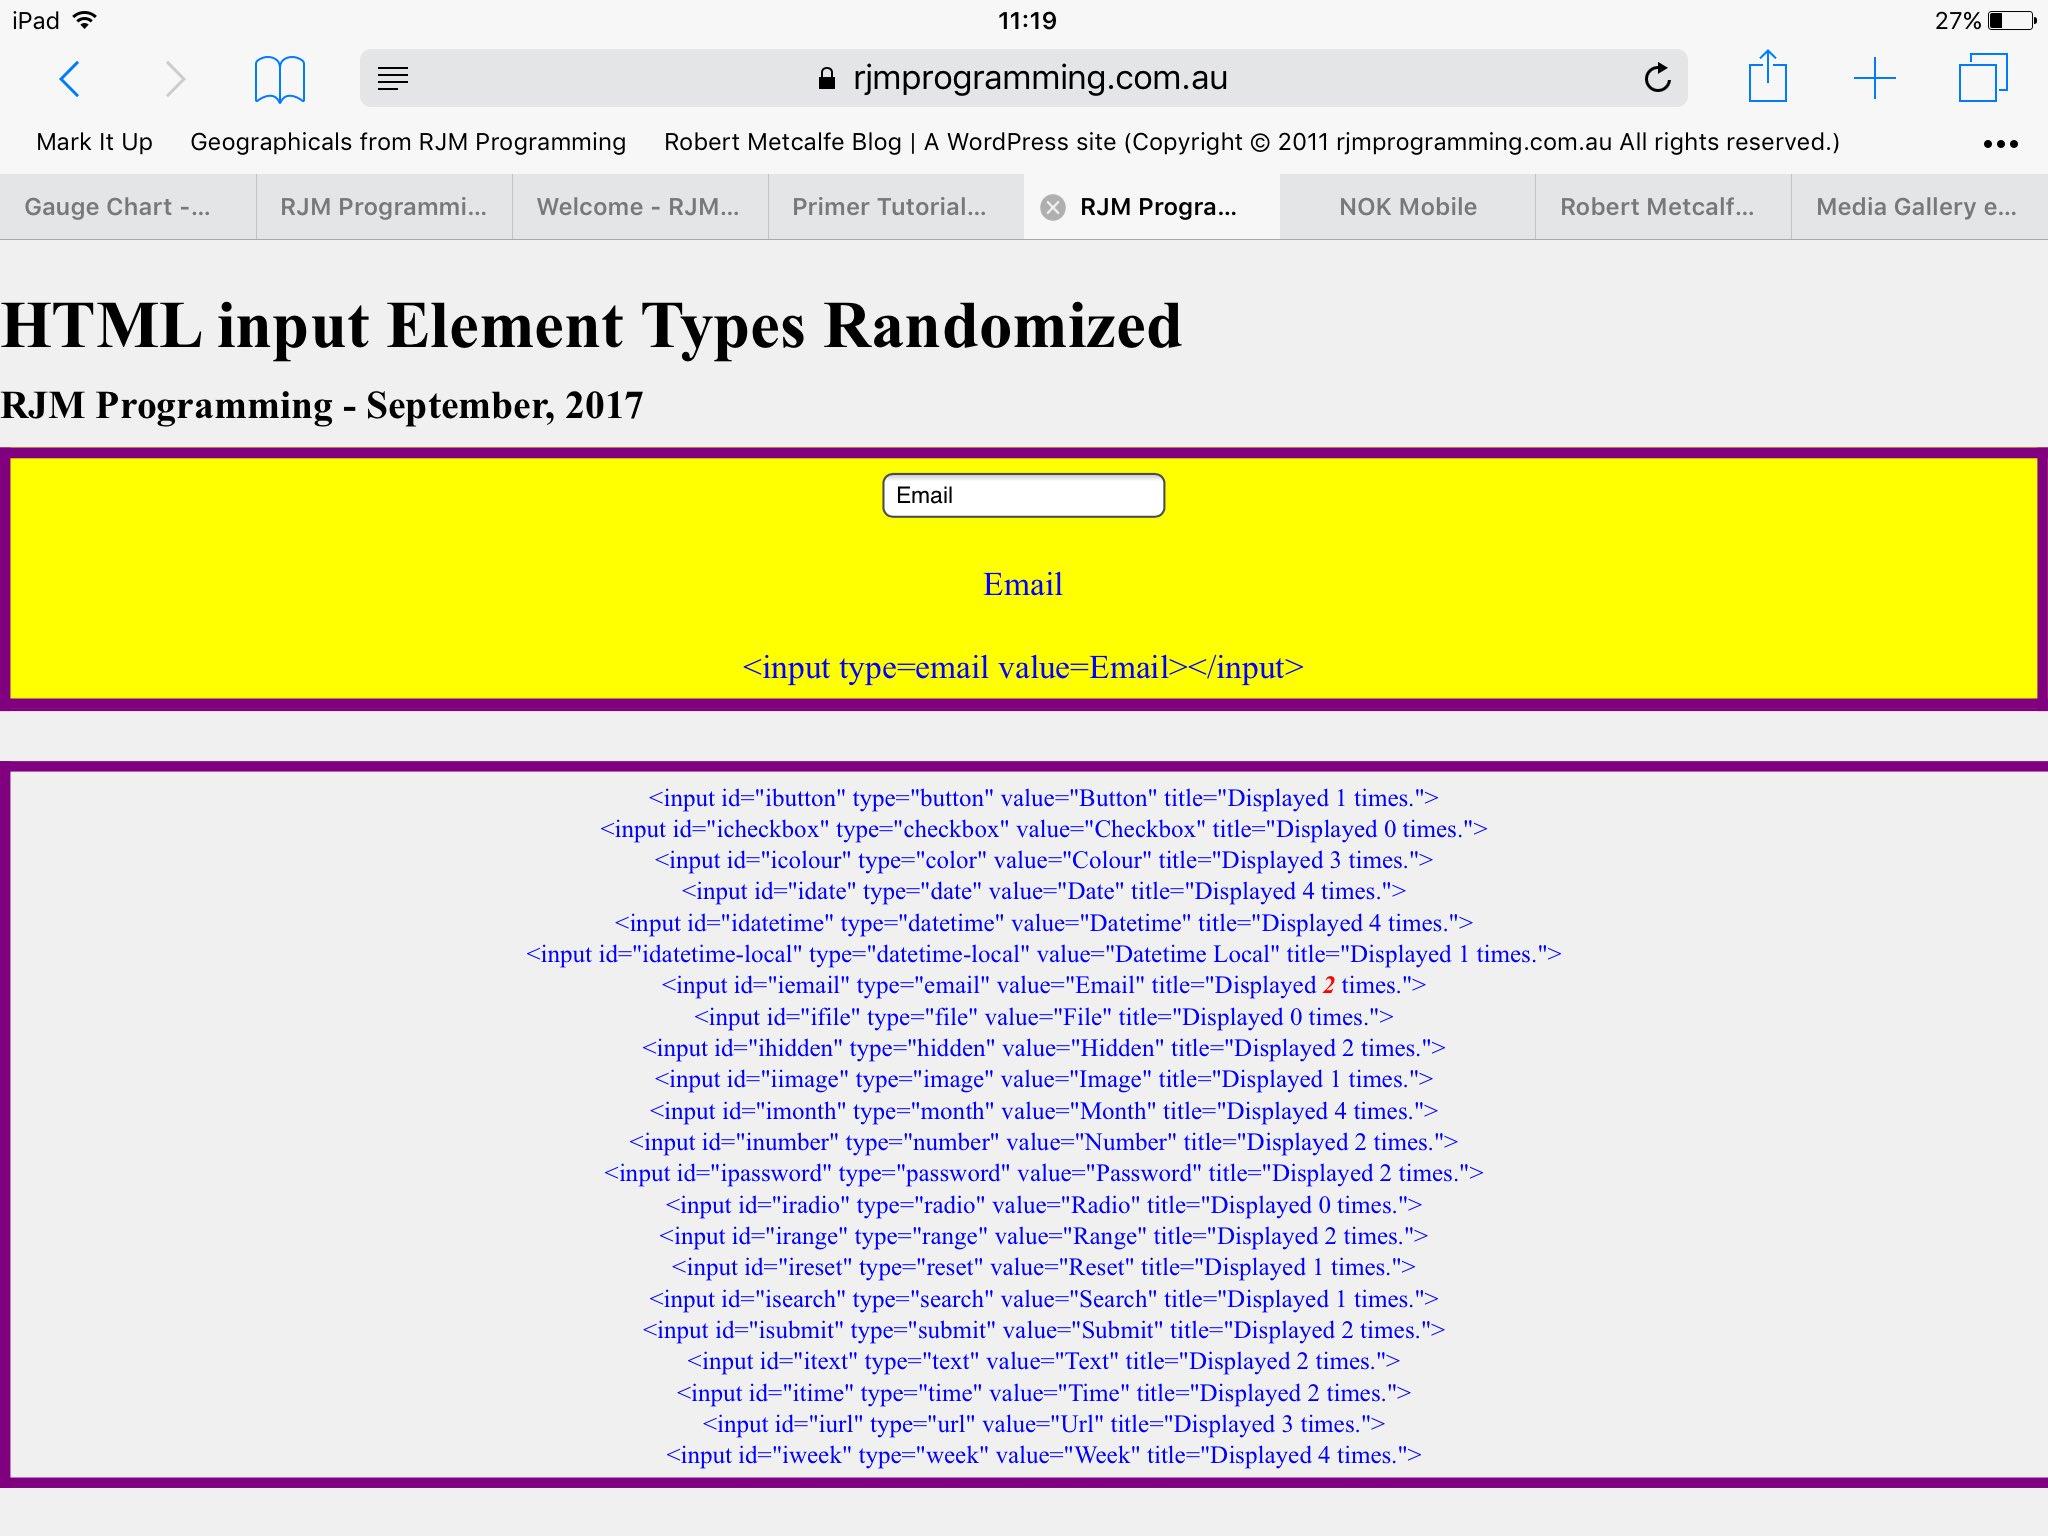 HTML Input Element Types Randomized History Tutorial